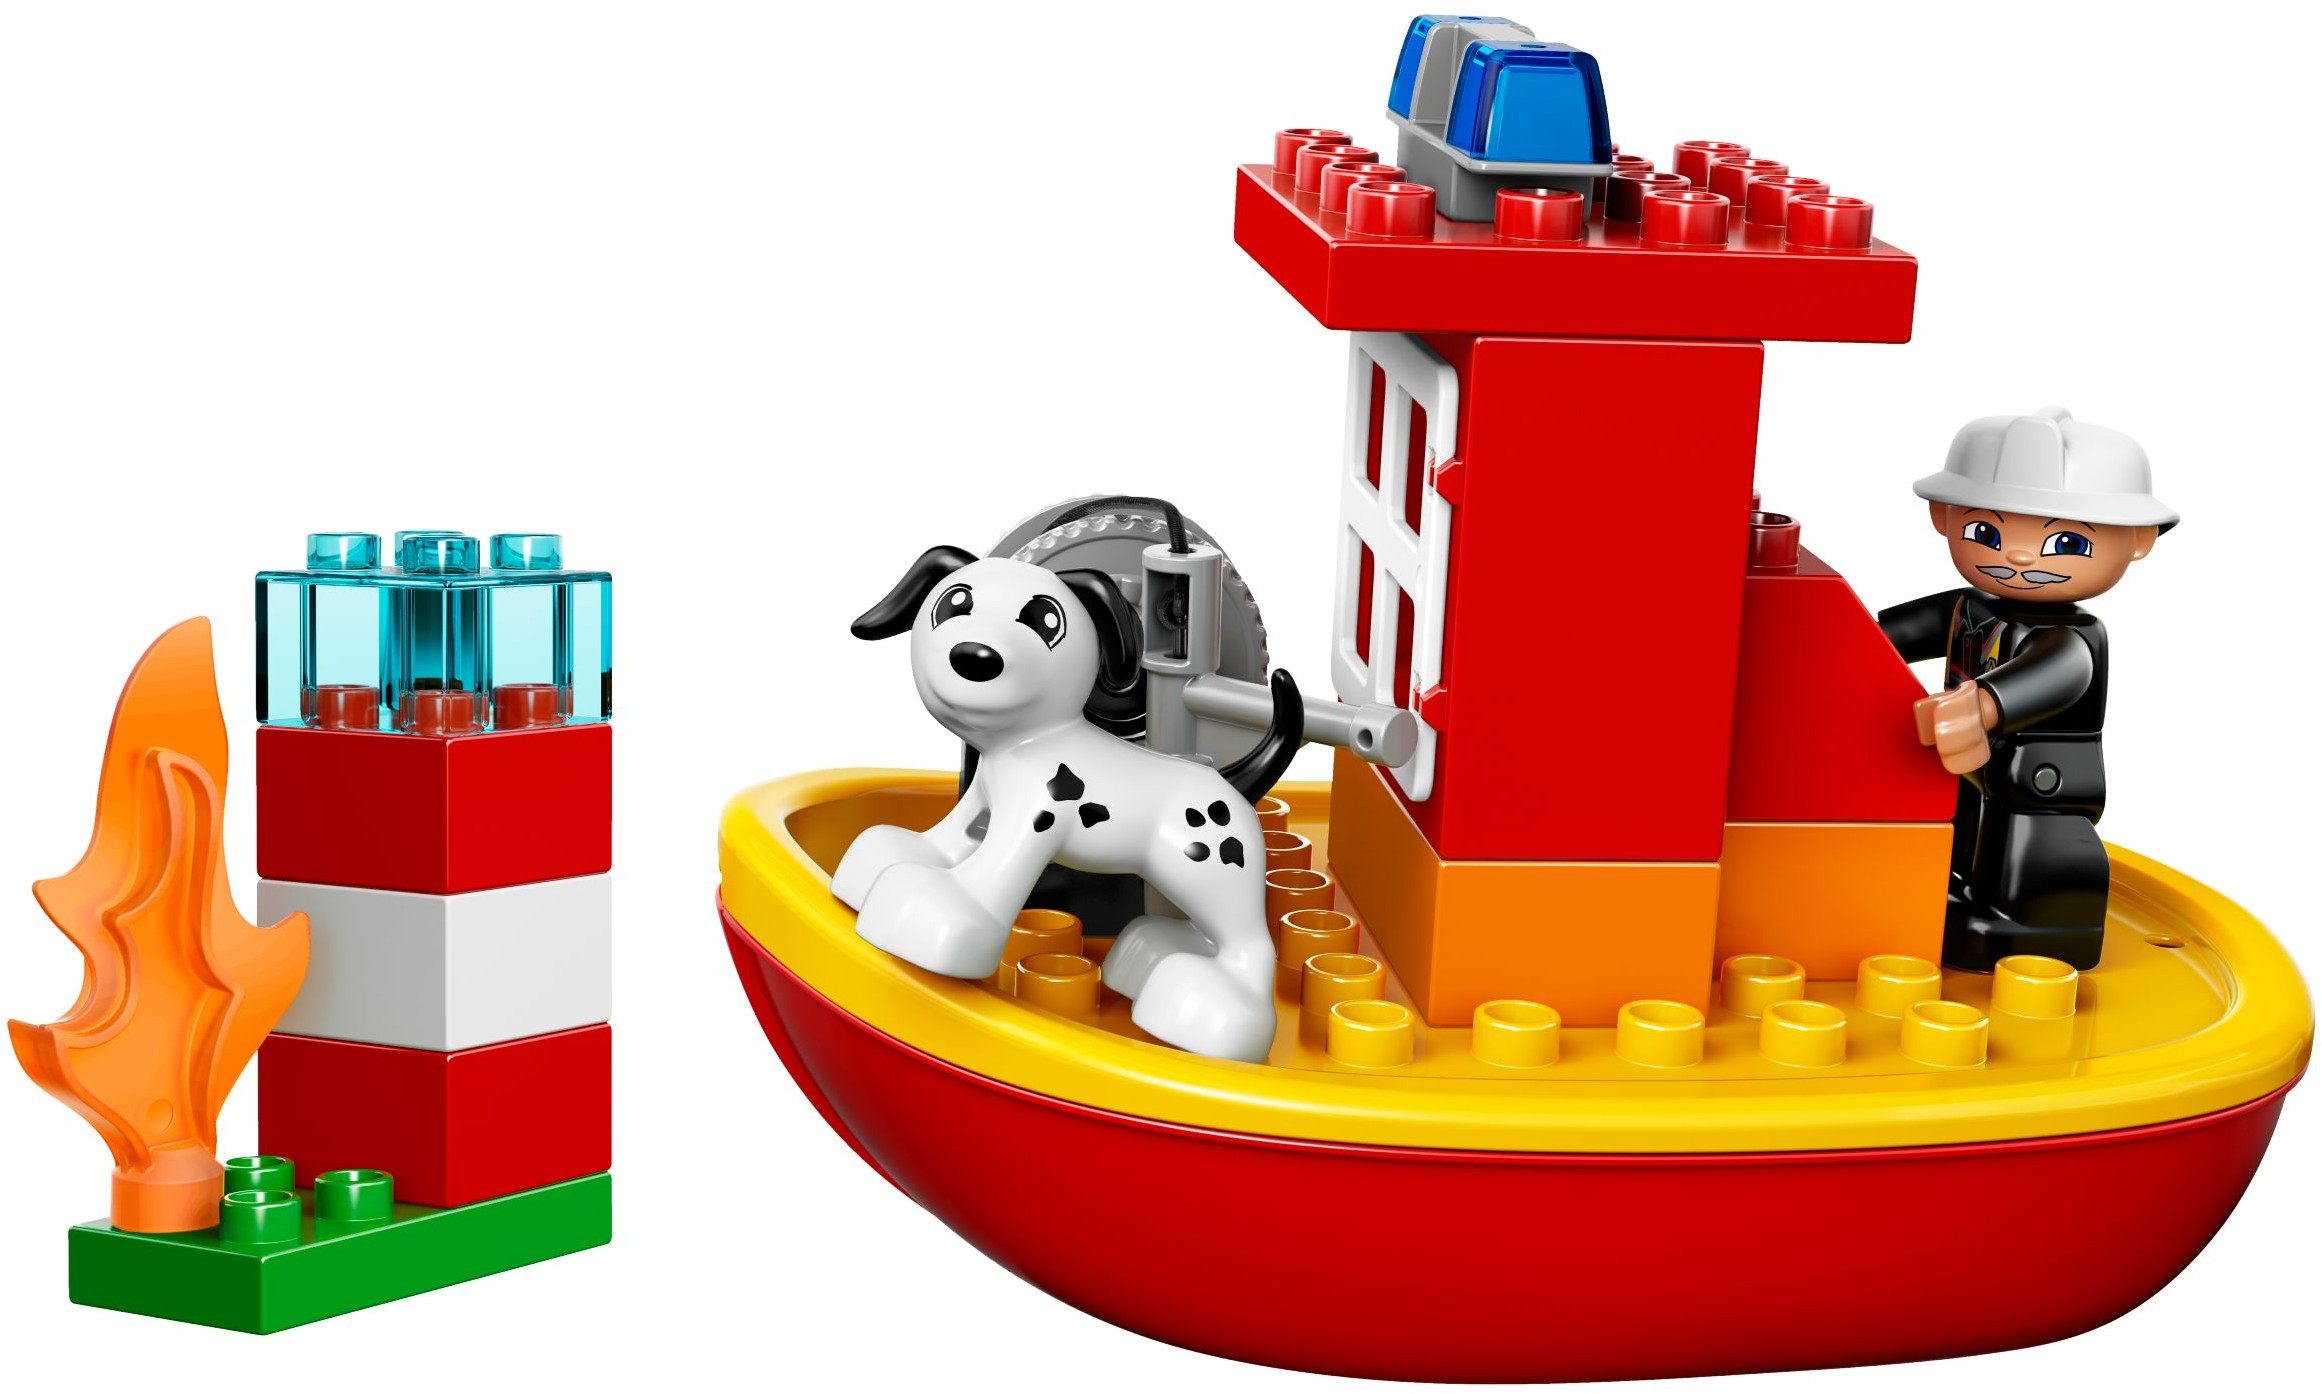 Duplo Fire Brickset Lego Set Guide And Database 10593 Station Boat